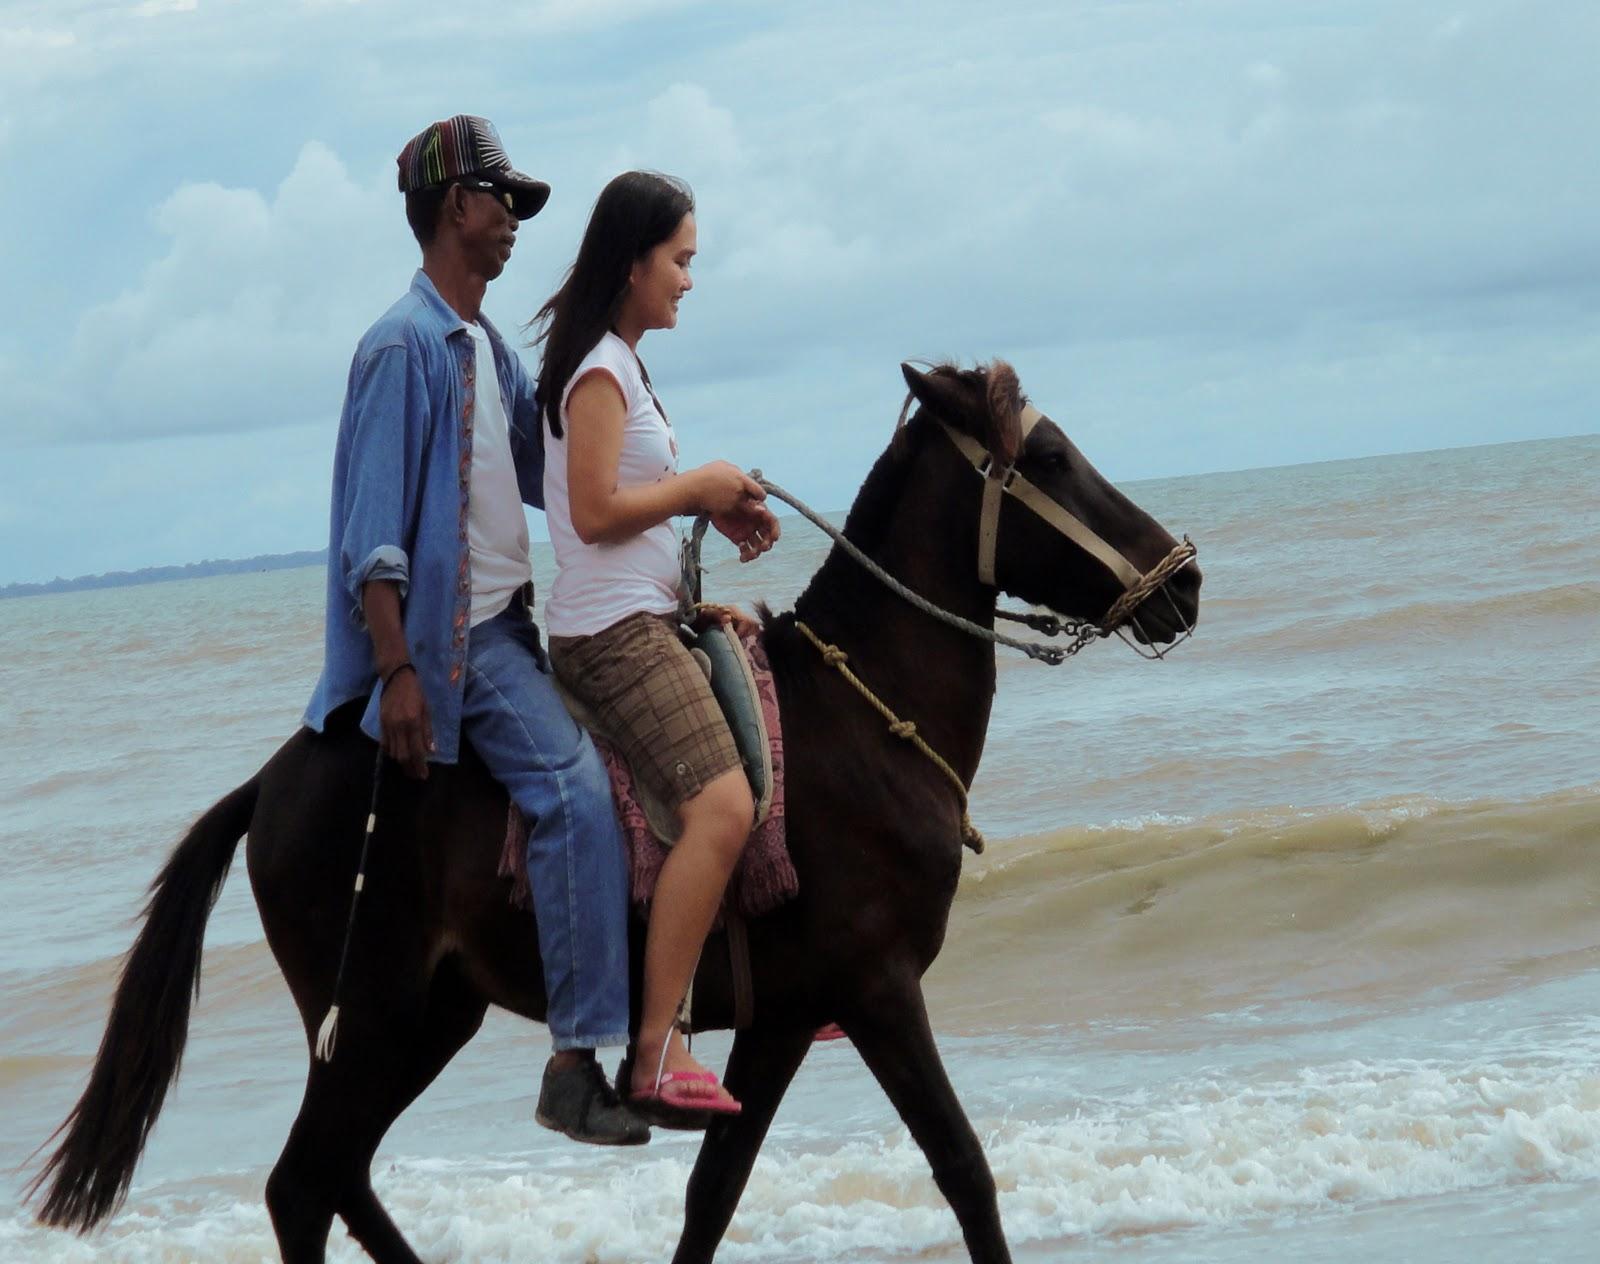 AnhawanHorseBackRiding - Make a Poem-Balak for this Woman Riding a Horse - Tira-Pasagad | Saksak-Sinagol